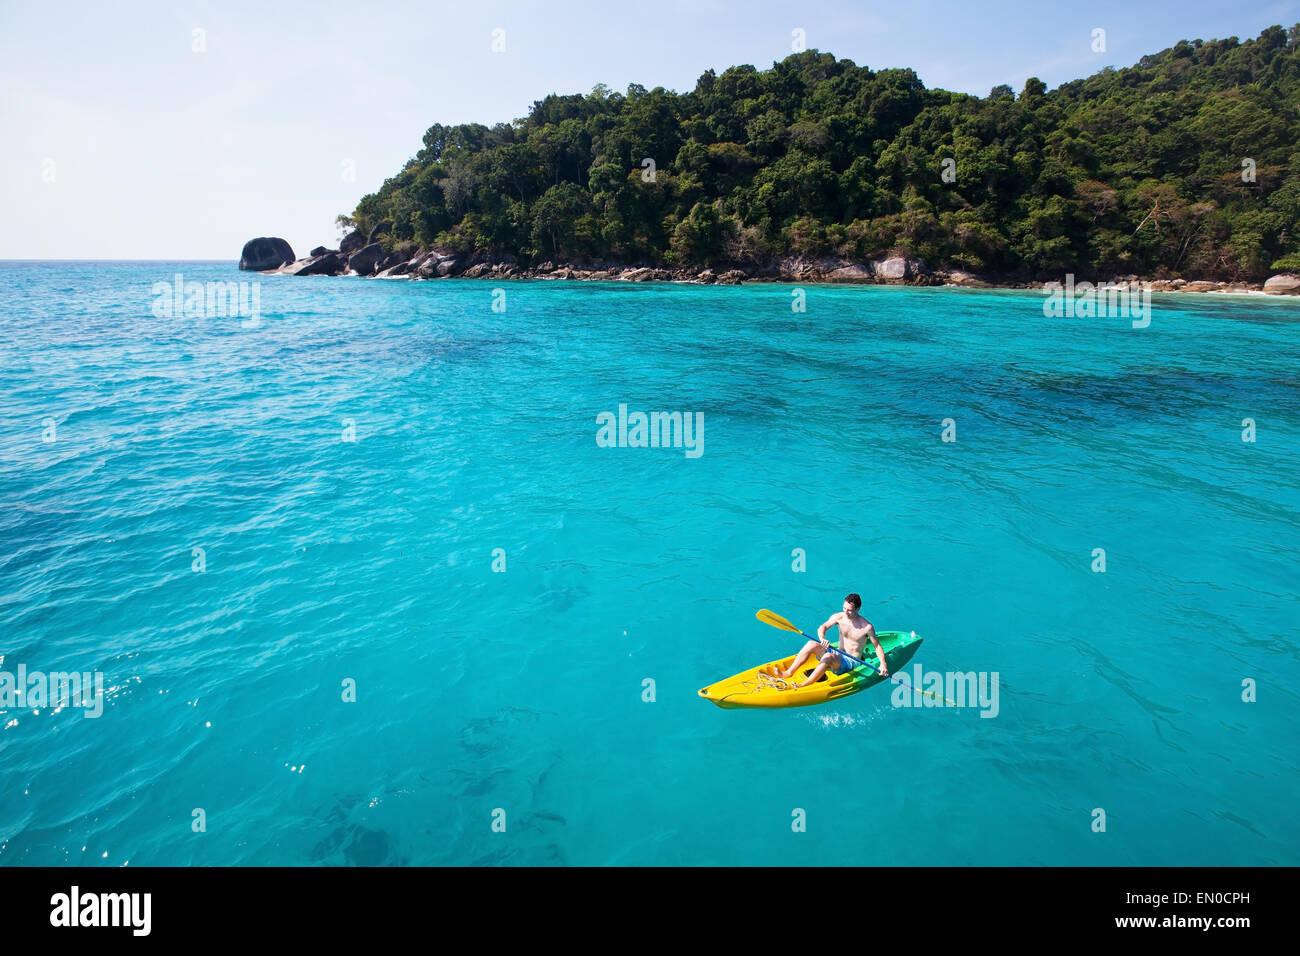 kayaking on paradise beach - Stock Image